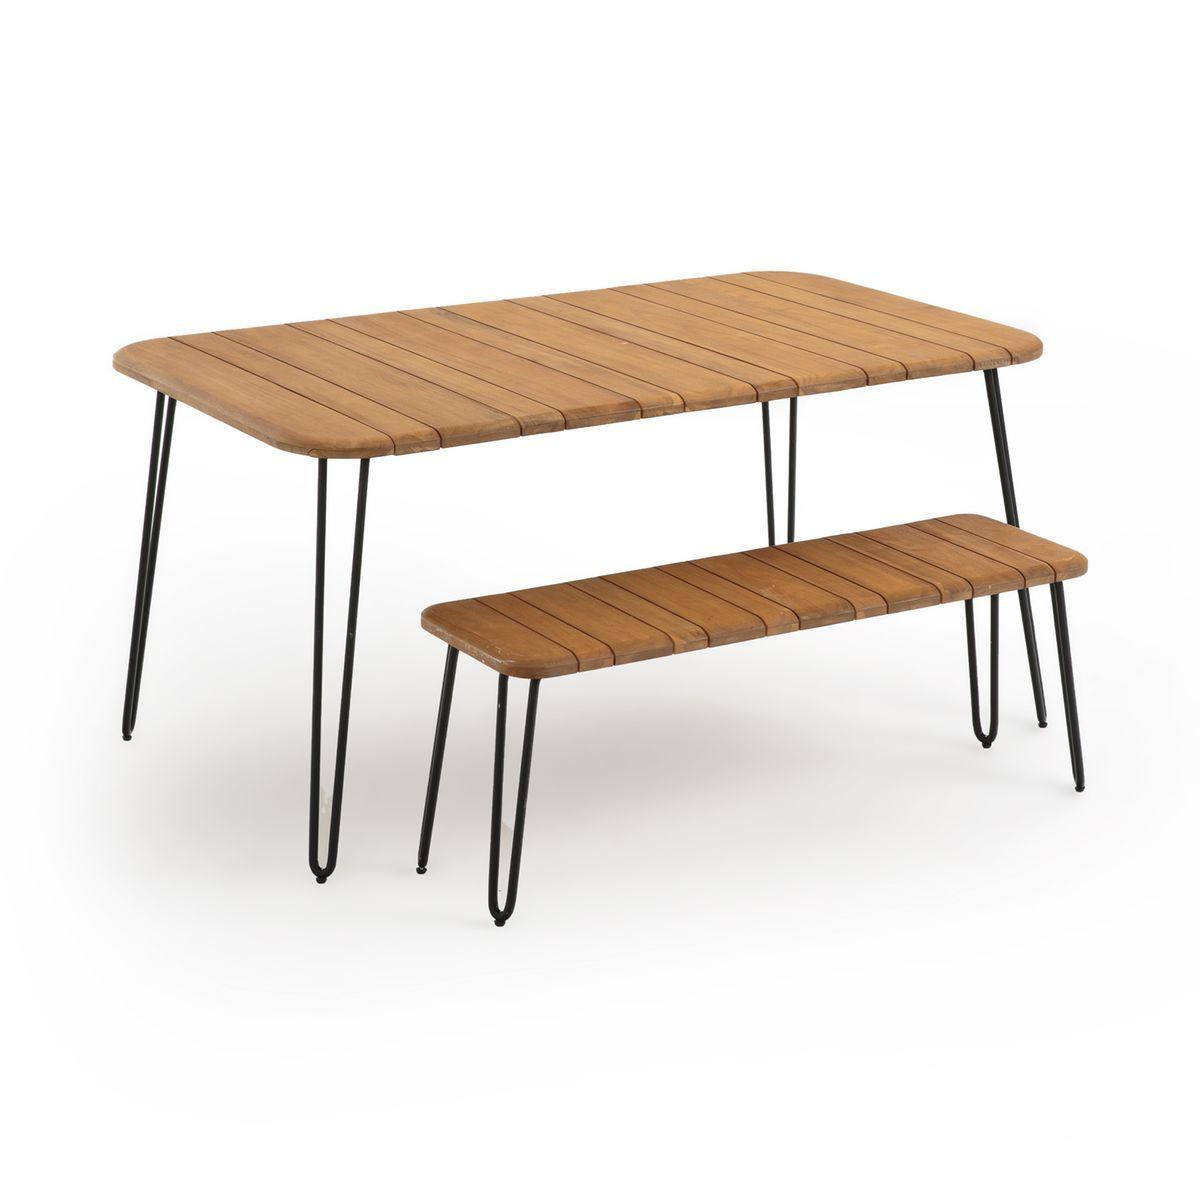 Table Pliante Spritz Acacia 6 Personnes Taille Taille Unique